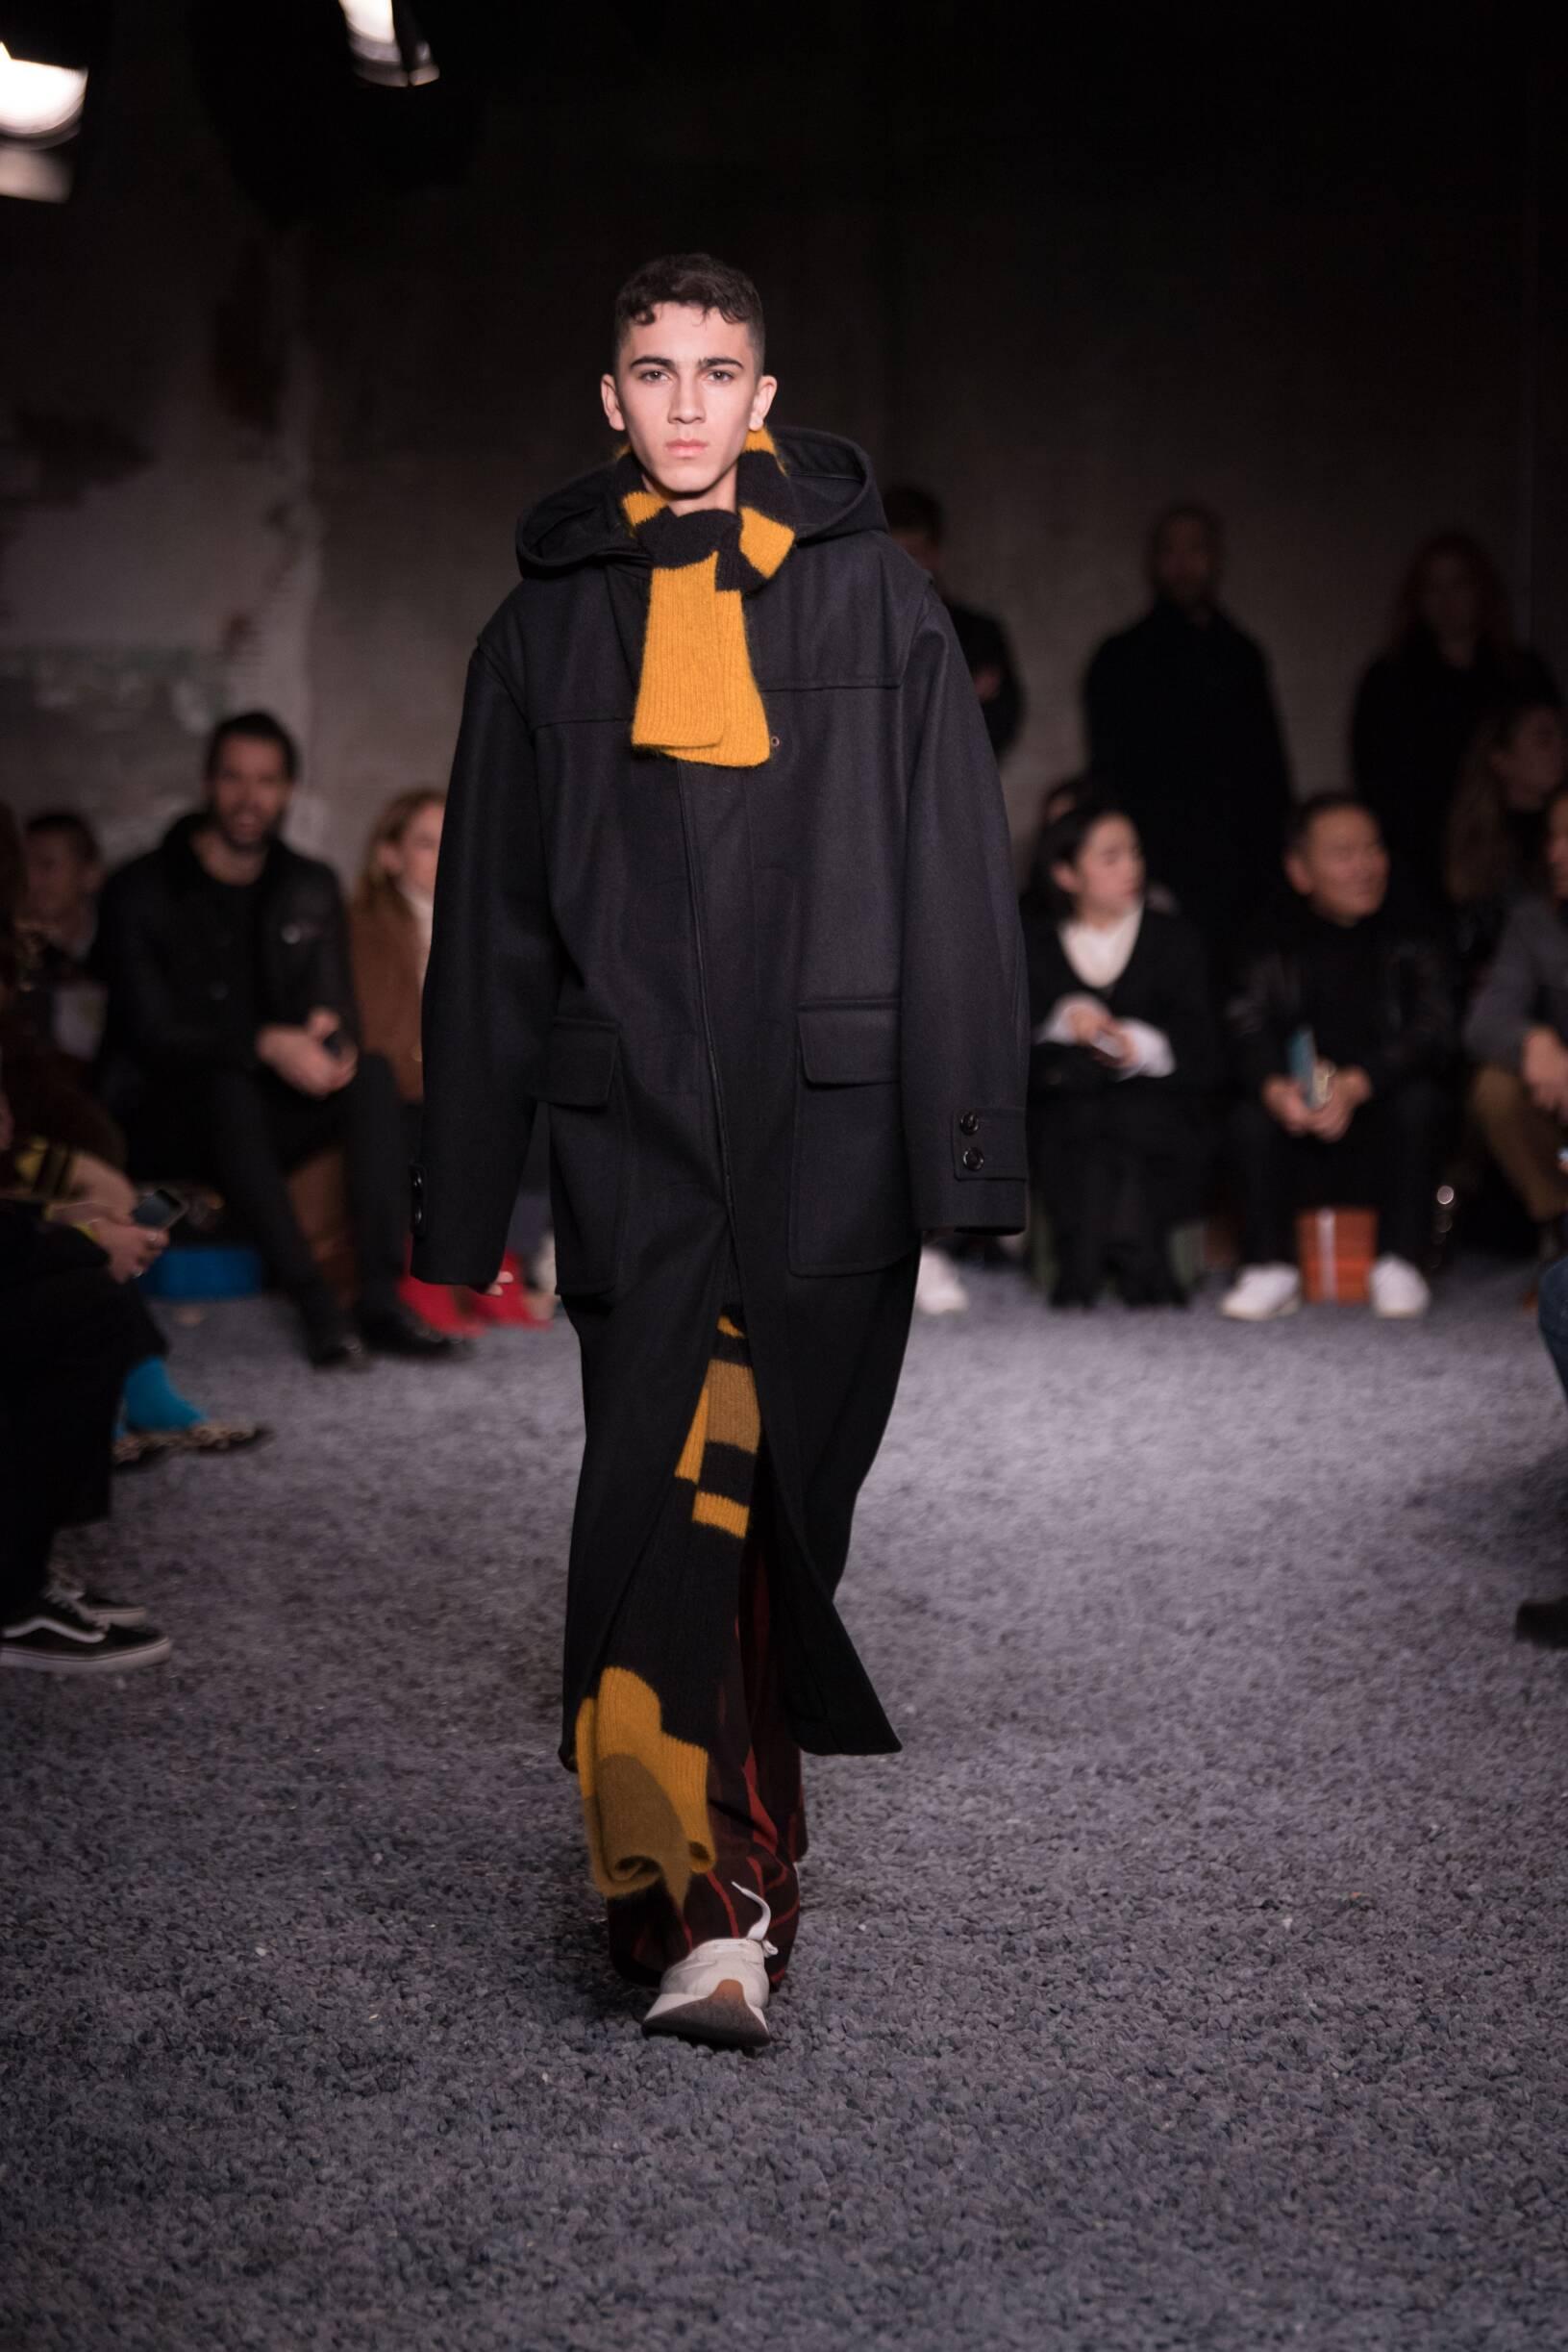 Runway Marni Fall Winter 2018 Men's Collection Milan Fashion Week